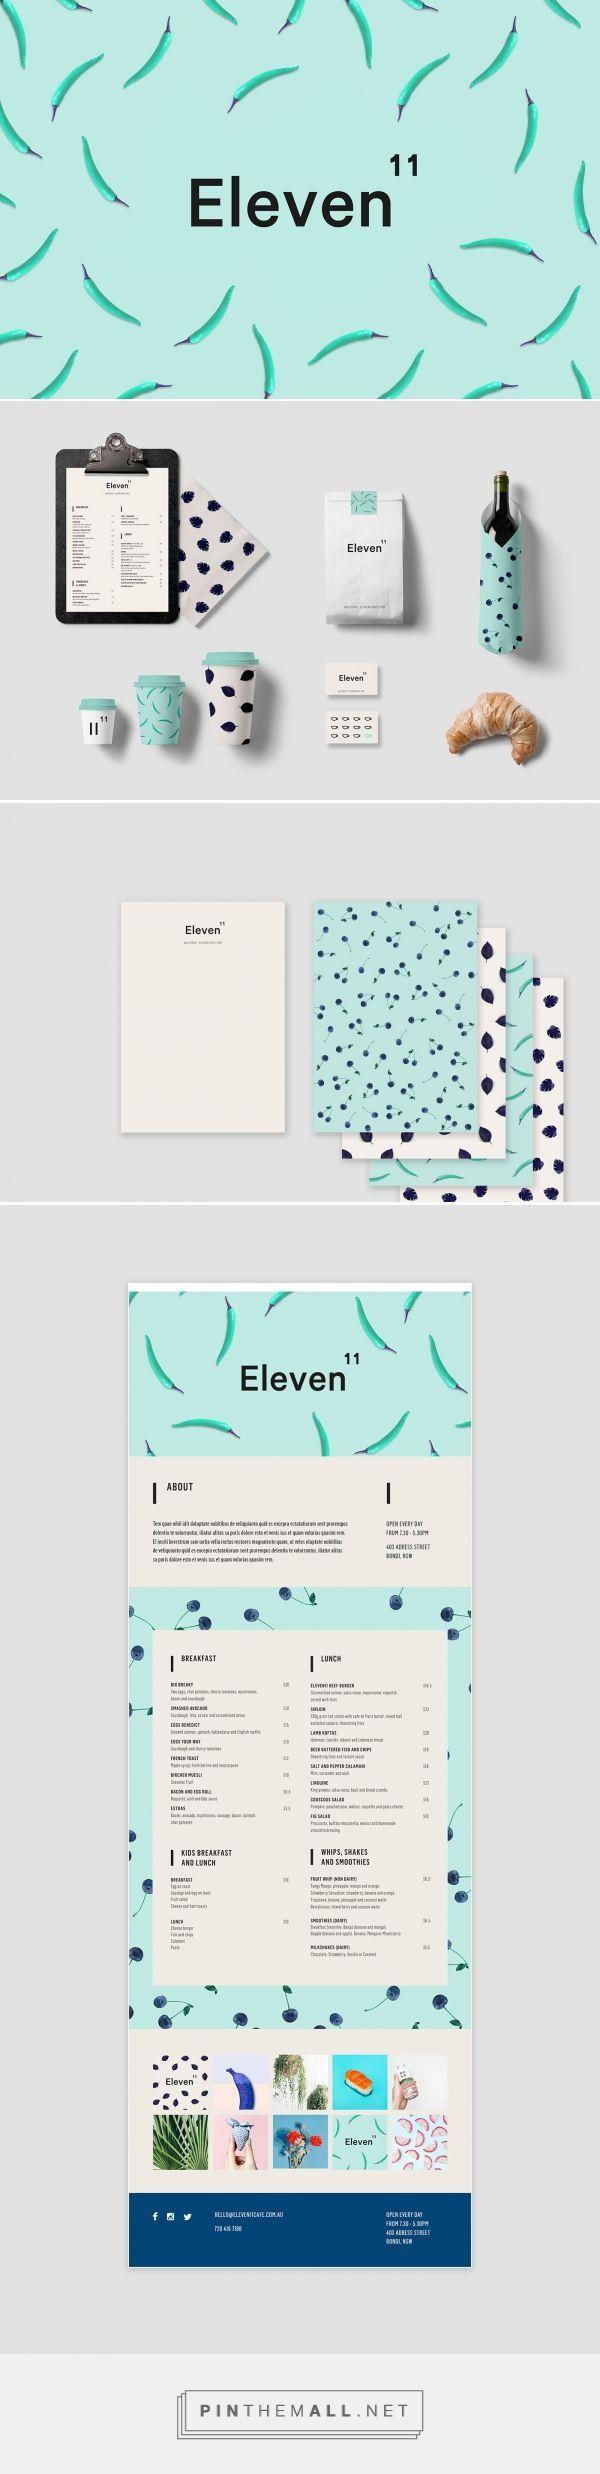 Eleven11 Branding by Soon Co.                                                                                                                                                                                 Más